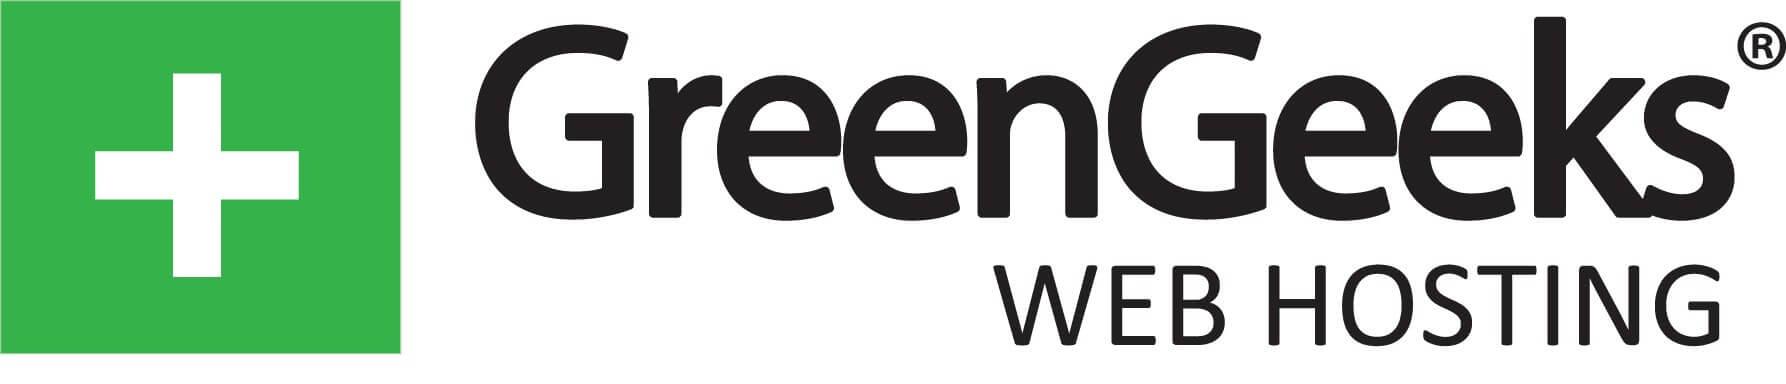 GreenGeeks Coupons